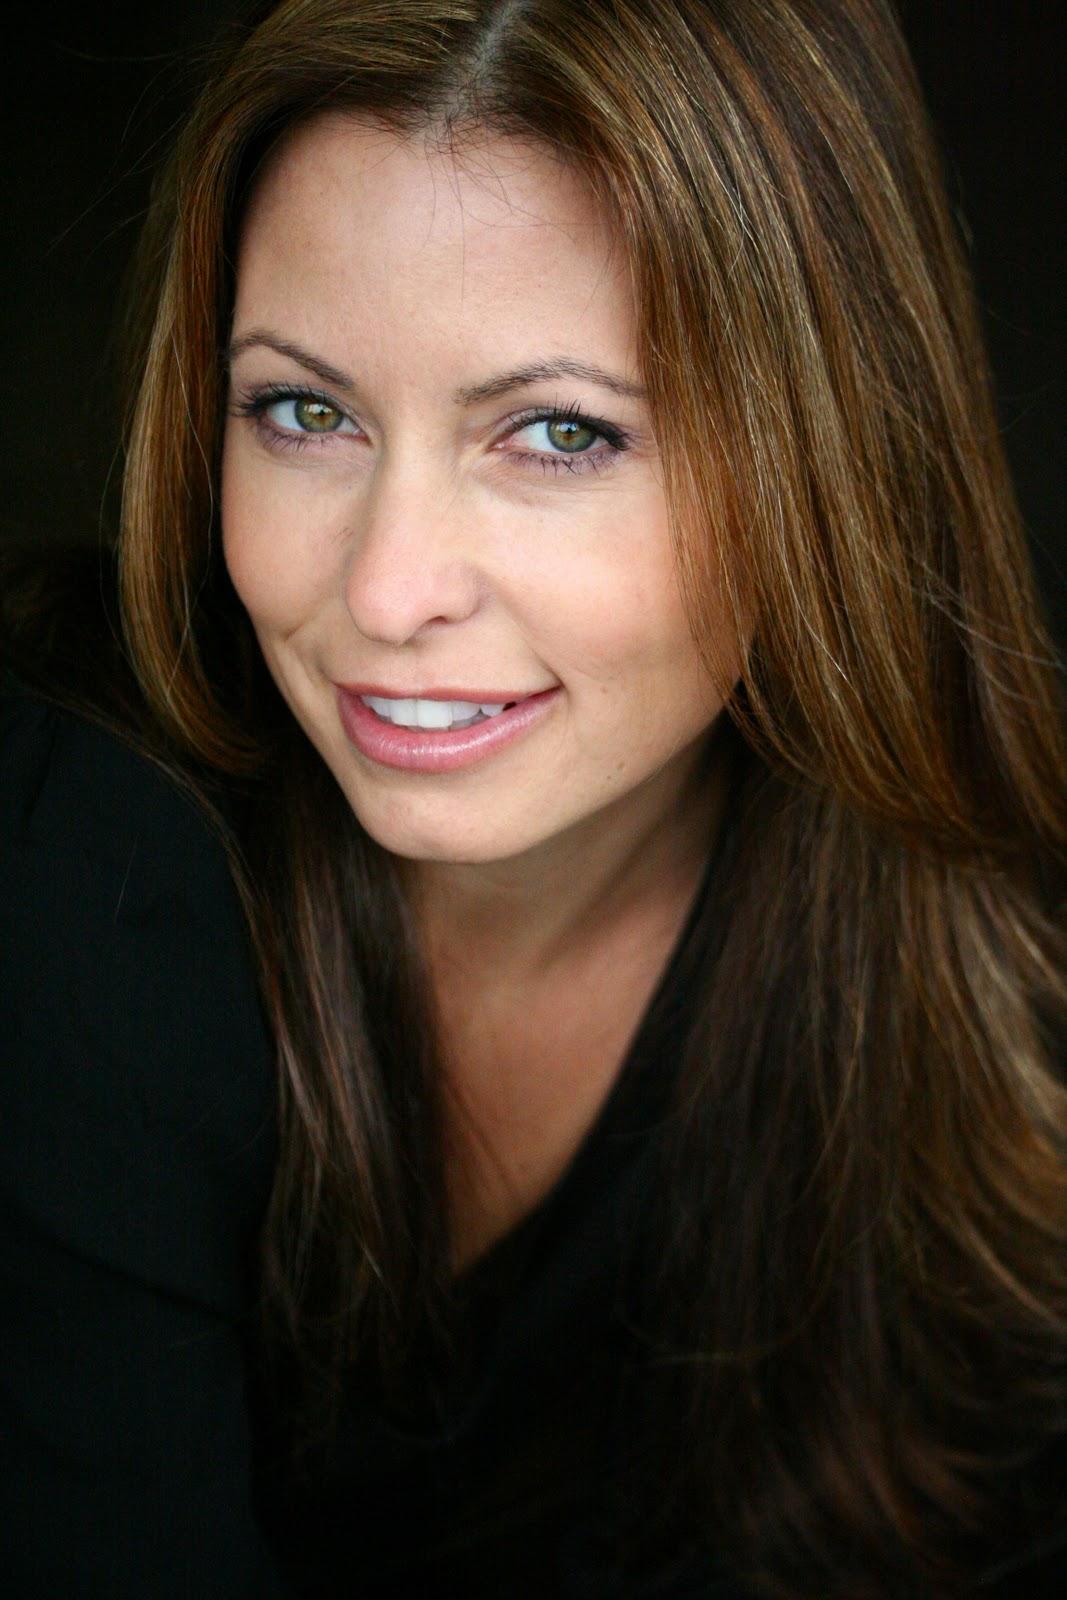 Lori Singer pics